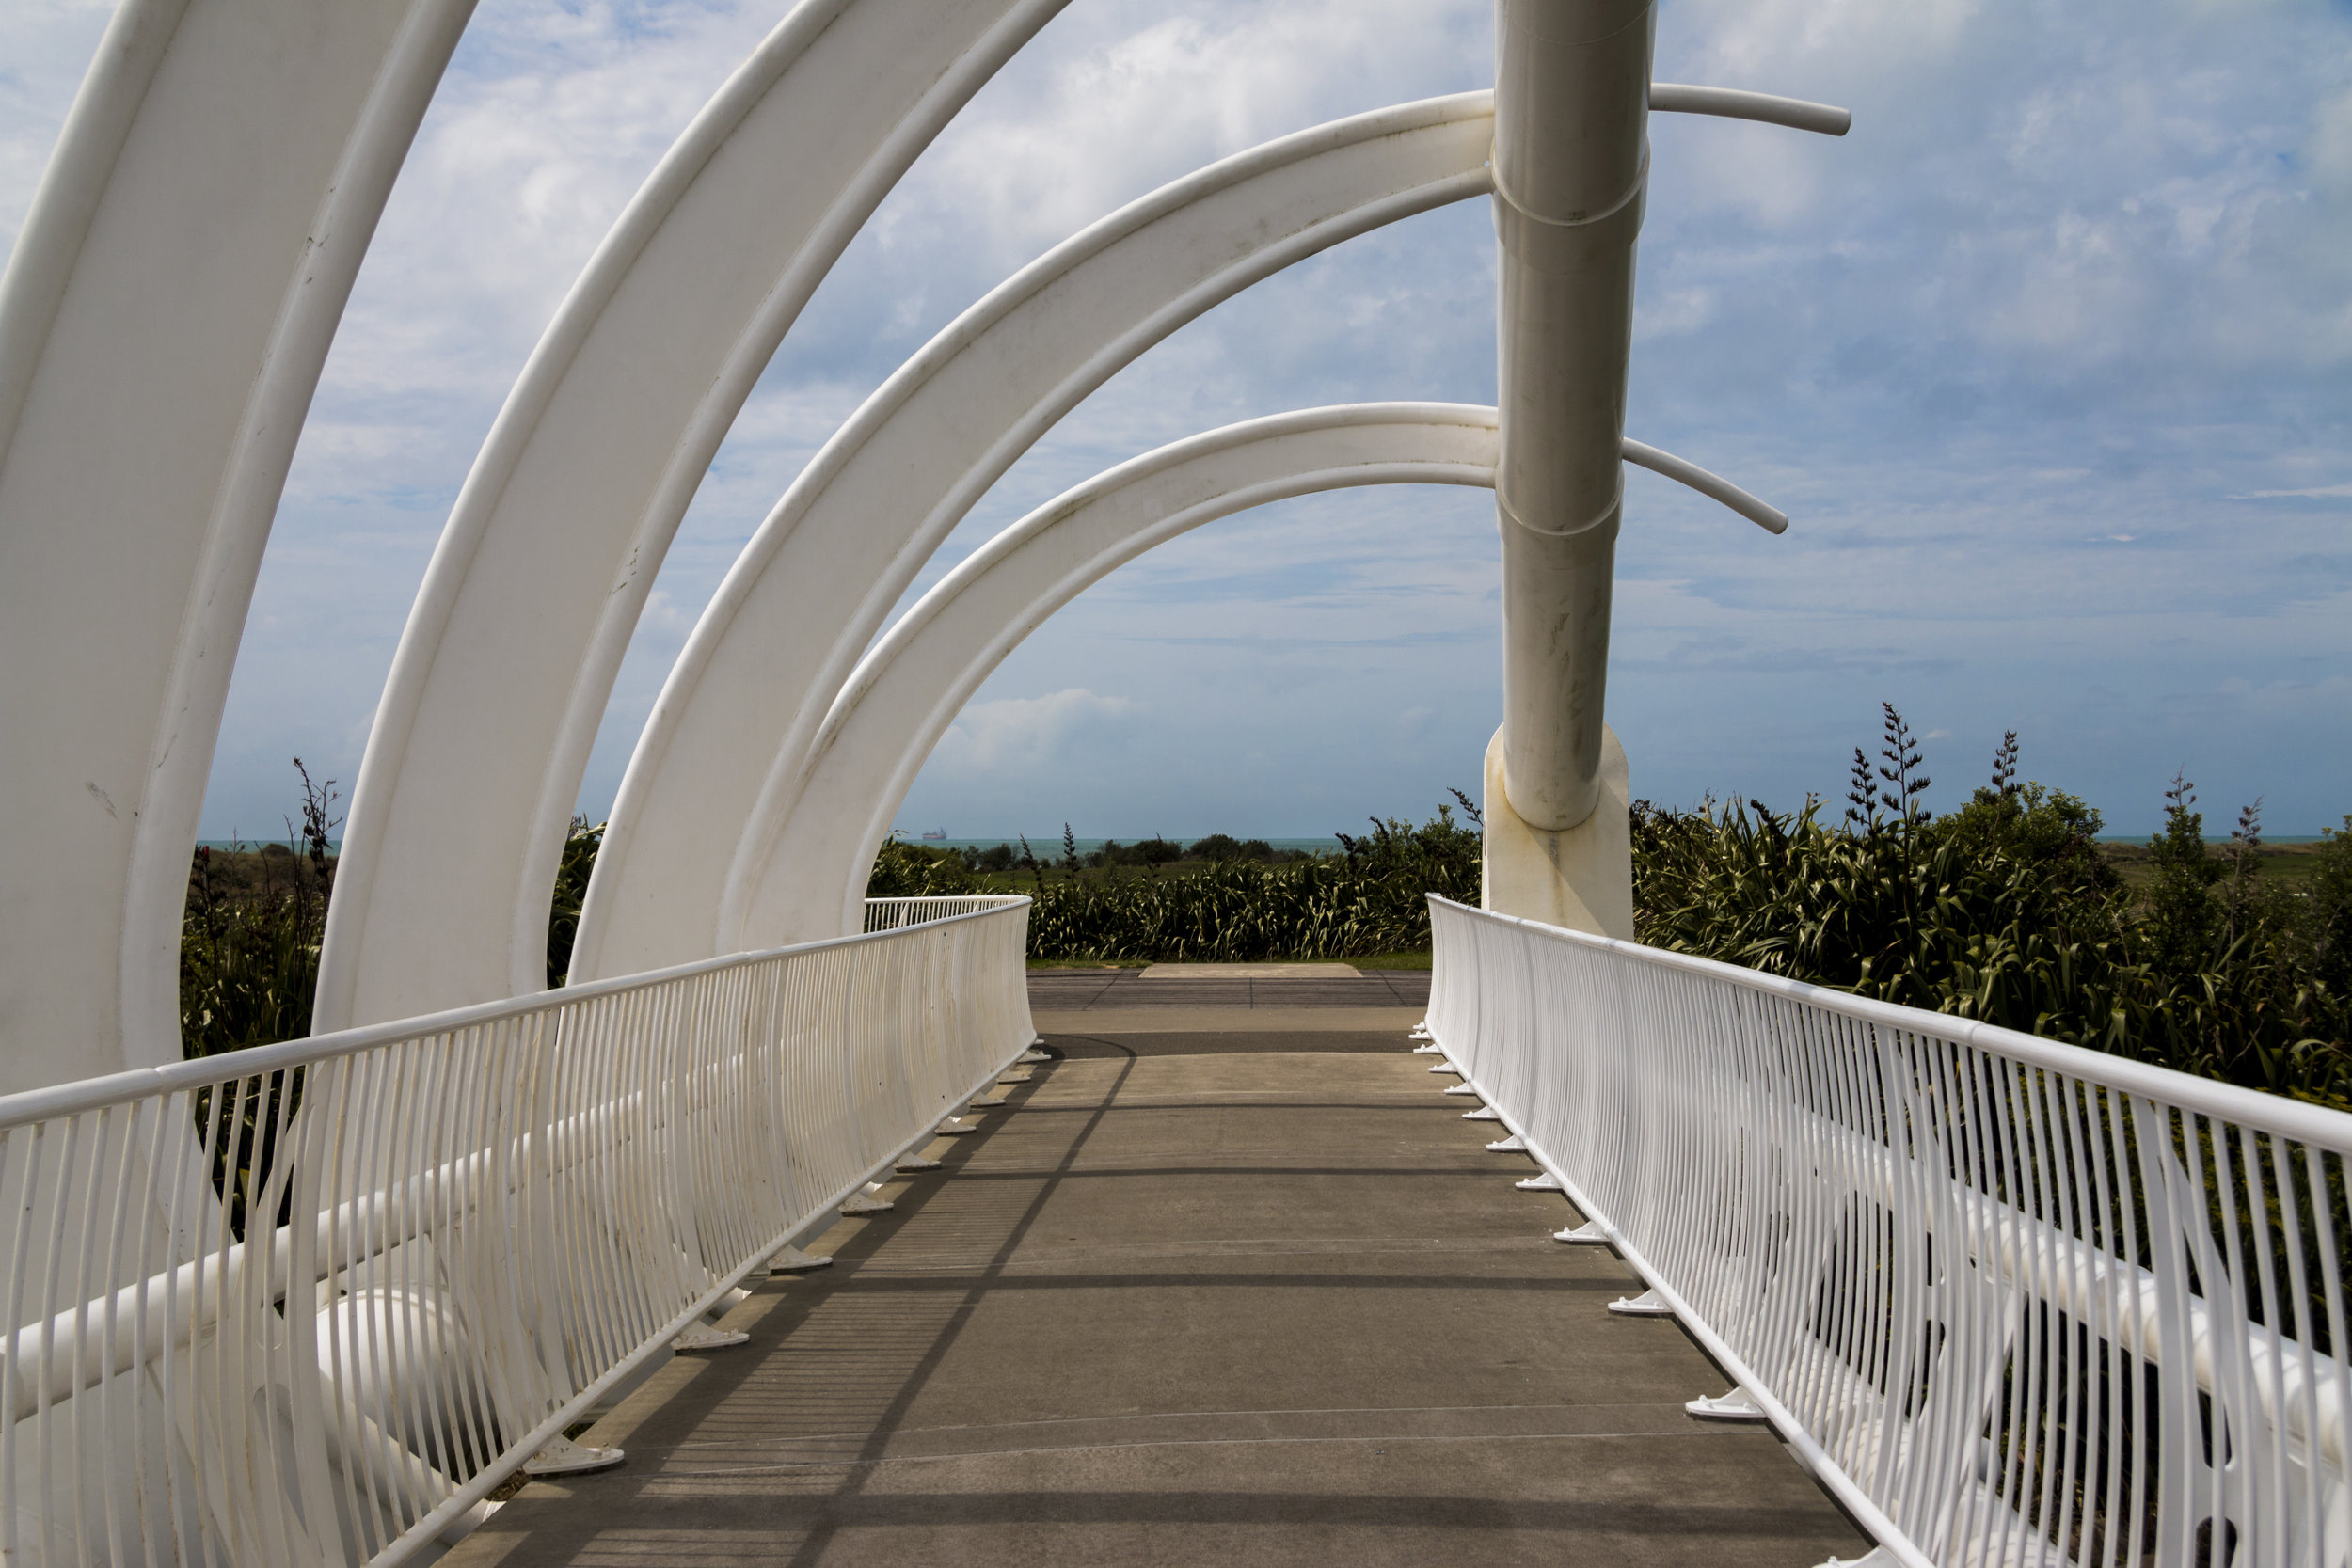 fakemilleniumbridge.jpg